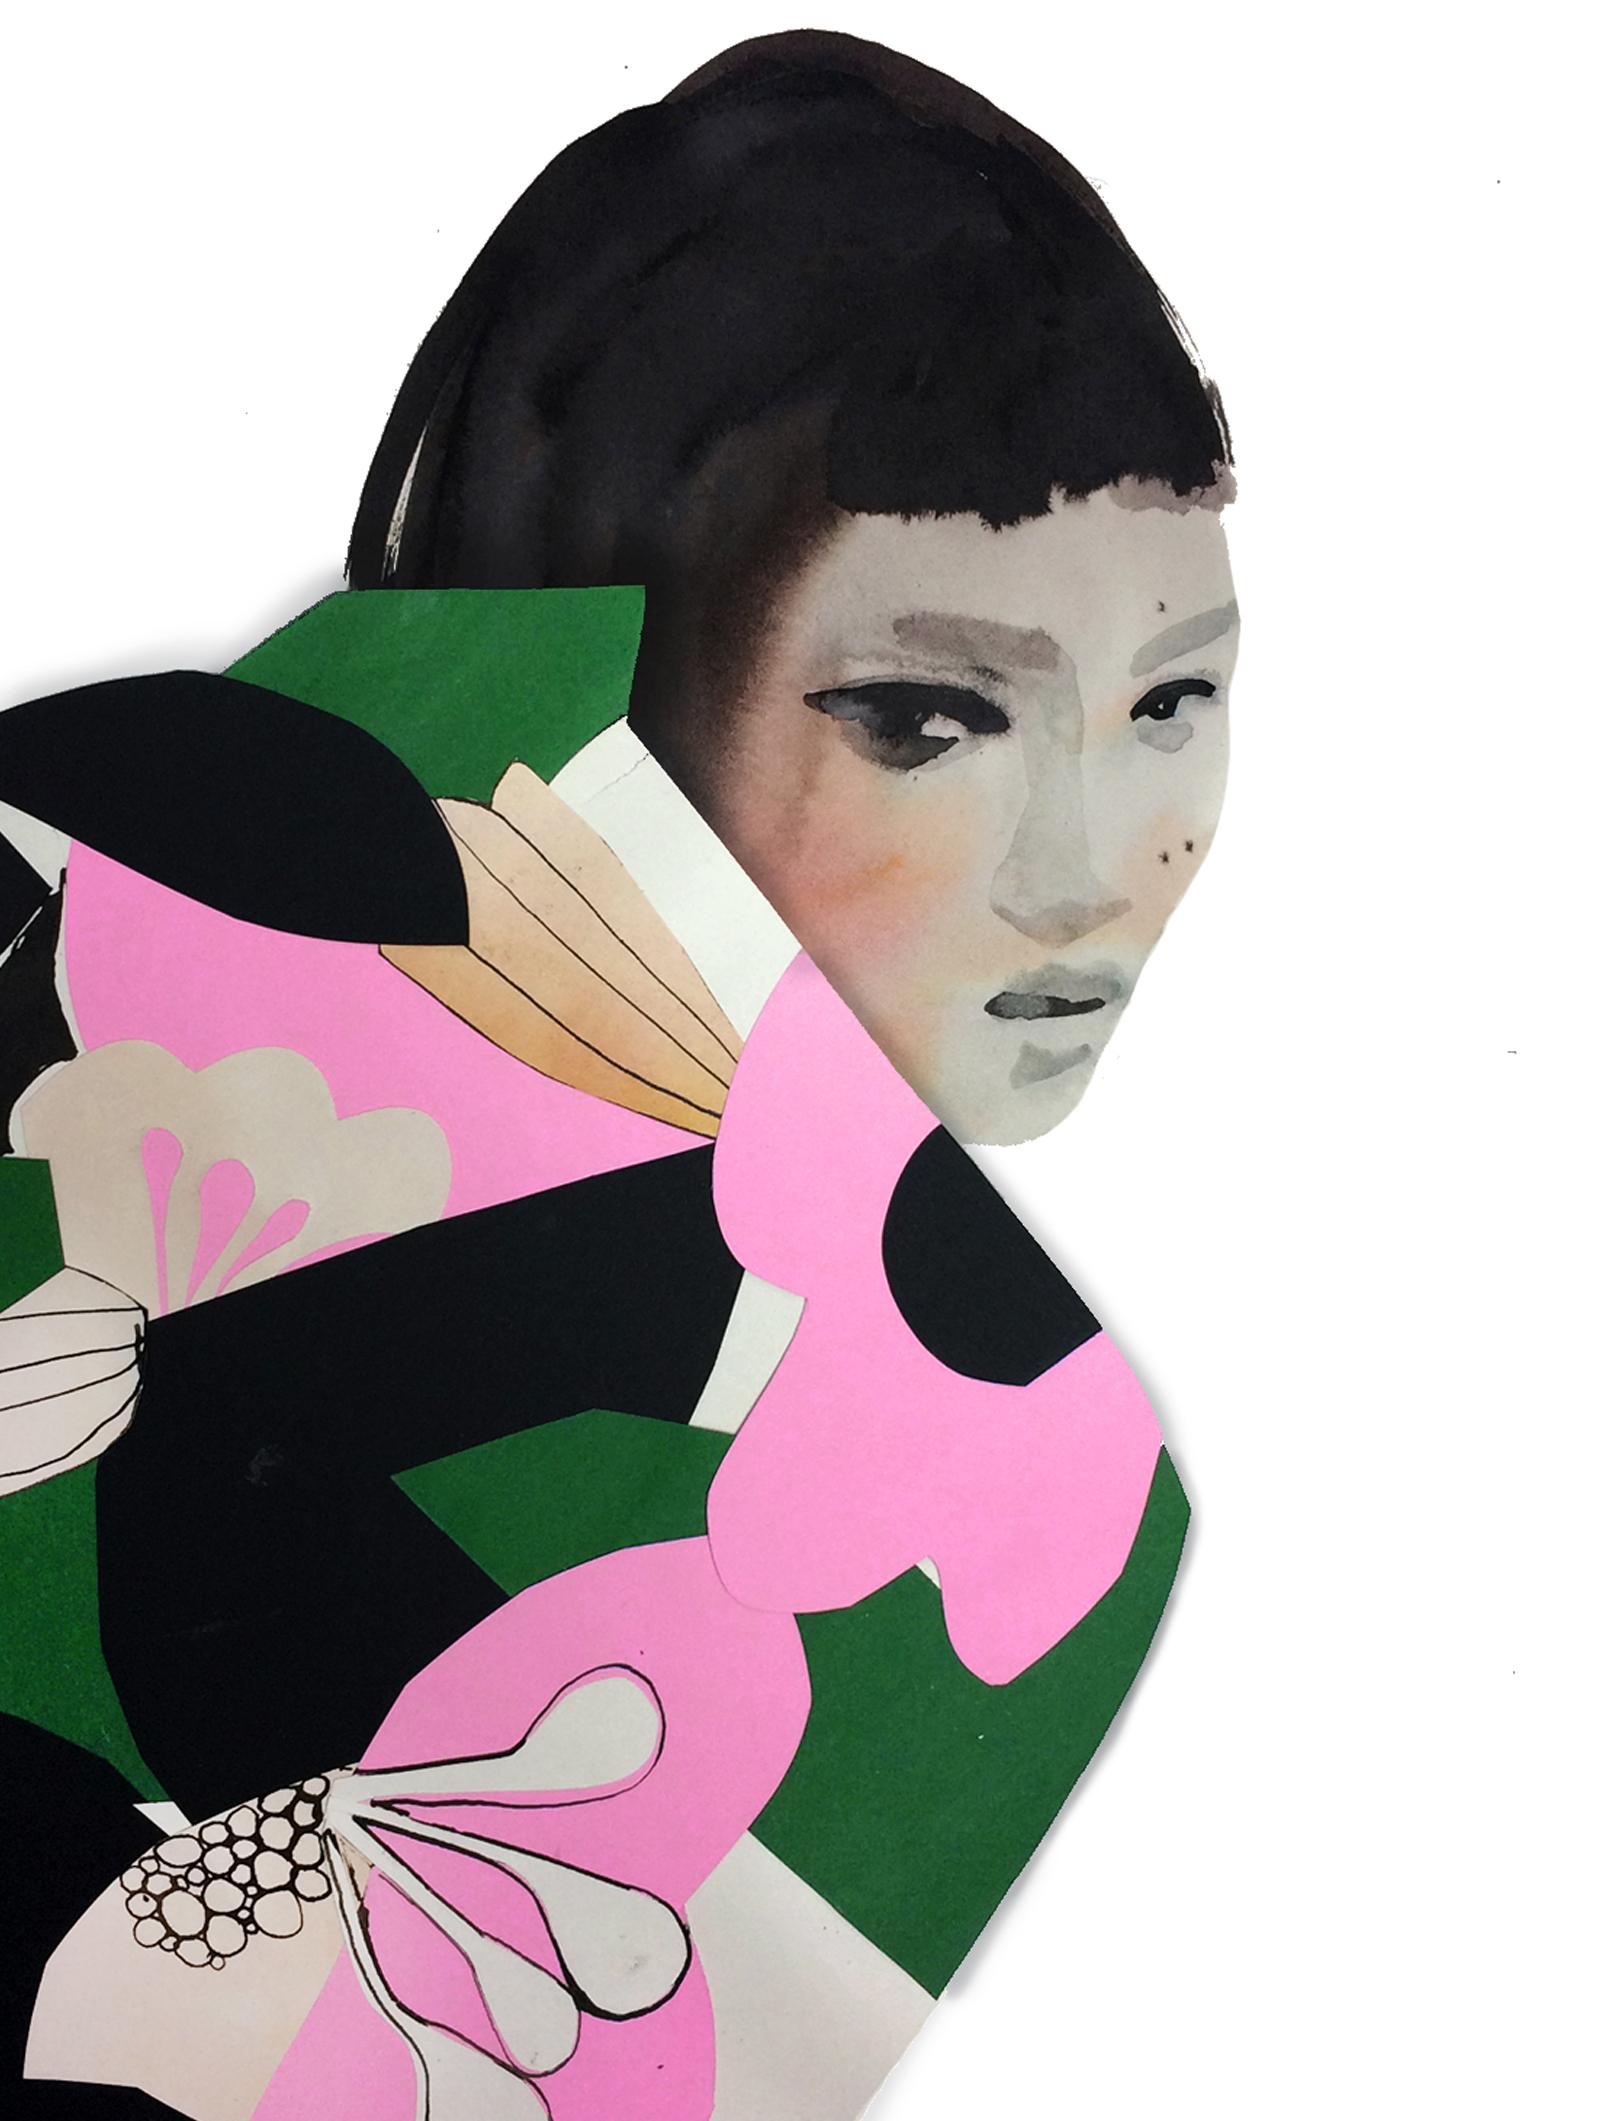 stina-persson-collage-kimono-jelly-london-illustration 2.jpg